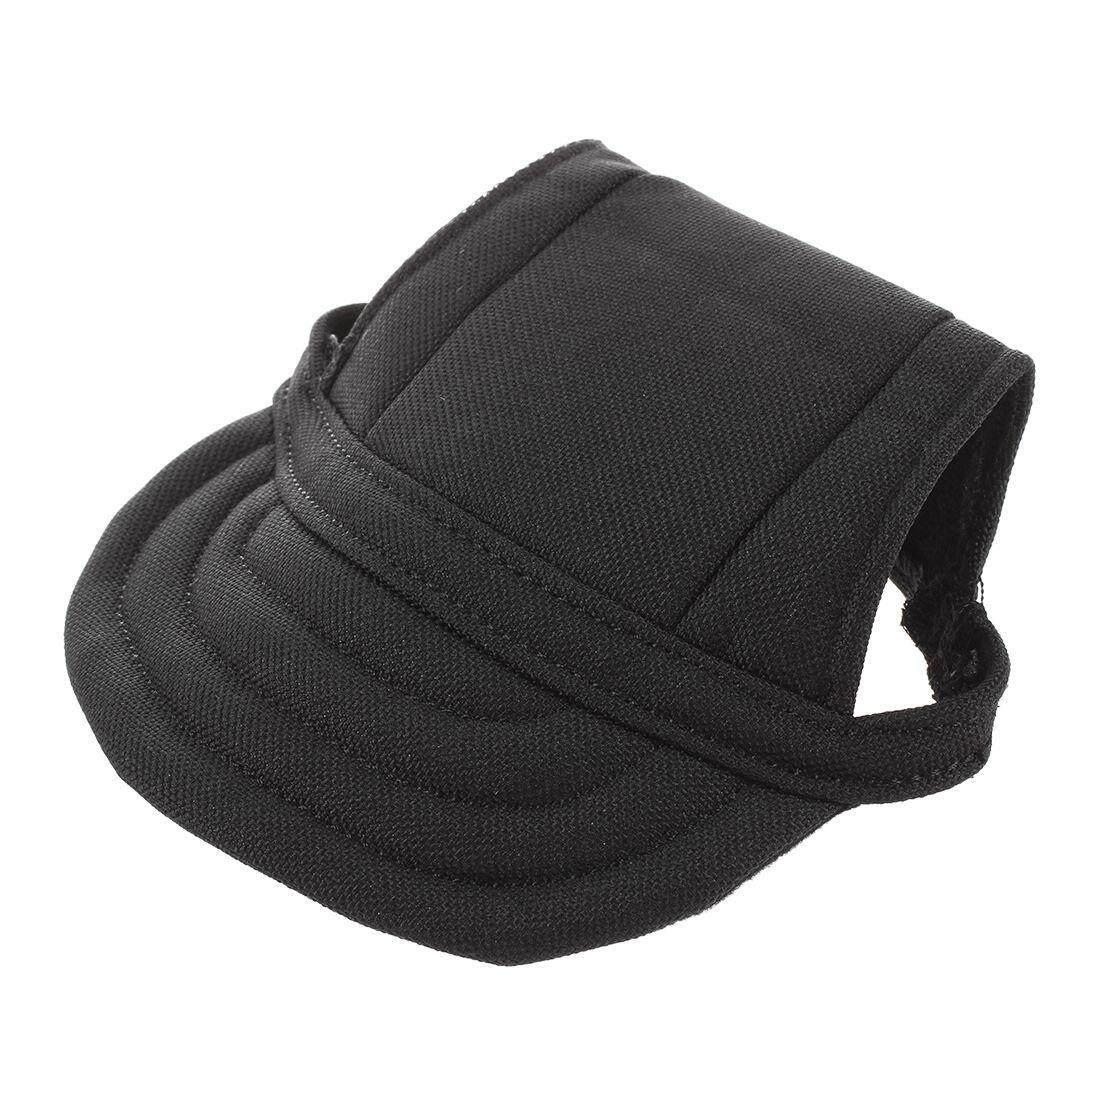 64e33403ea7 Pet Dog Baseball Cap Sport Cap Hat - Outdoor Hat Sun Protection Summer Cap  for Small Medium ...